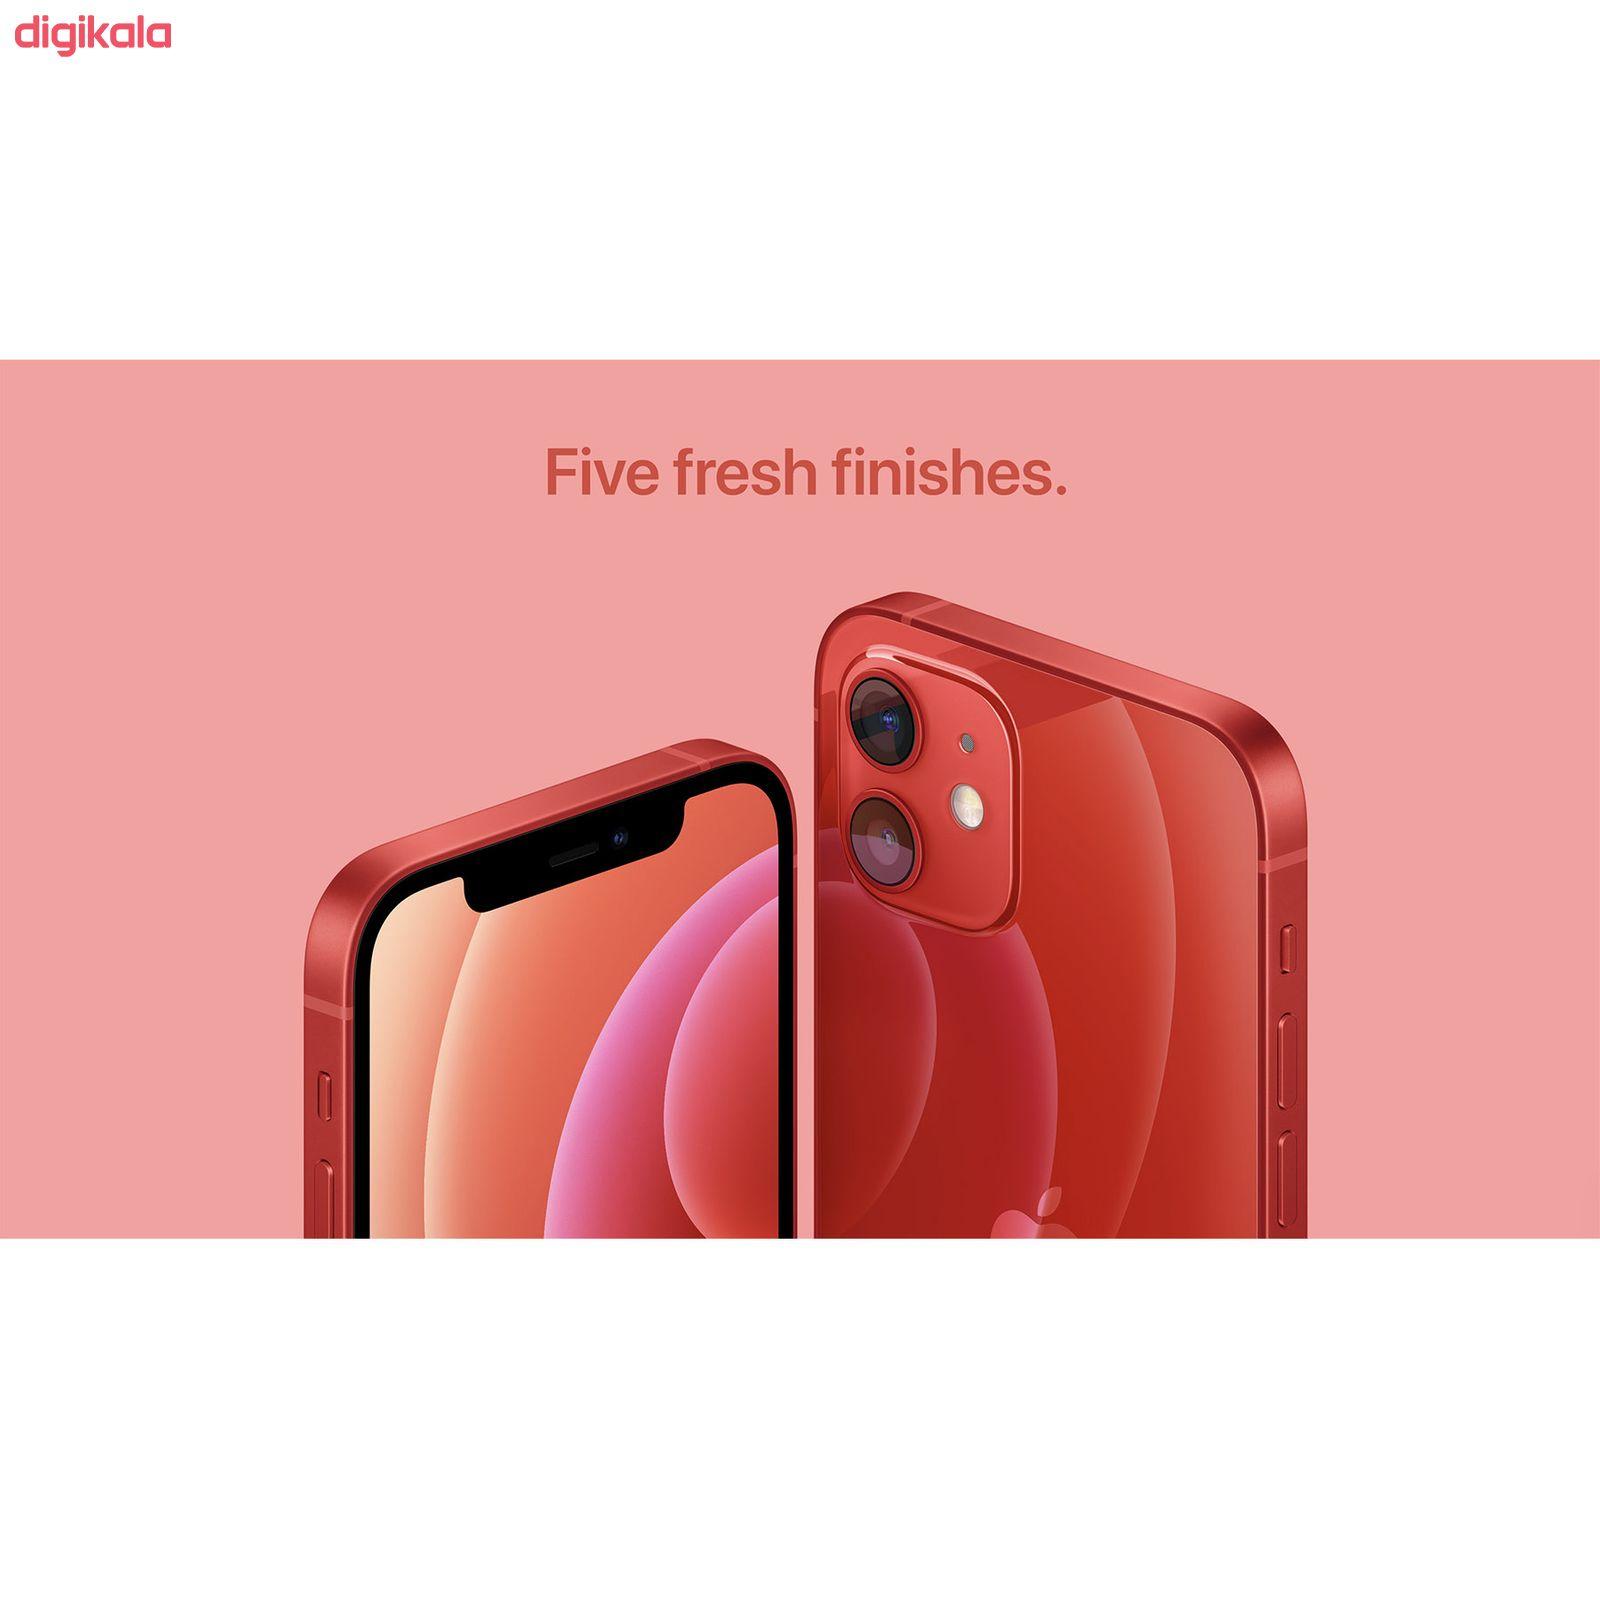 گوشی موبایل اپل مدل iPhone 12 A2404 دو سیم کارت ظرفیت 128 گیگابایت  main 1 9